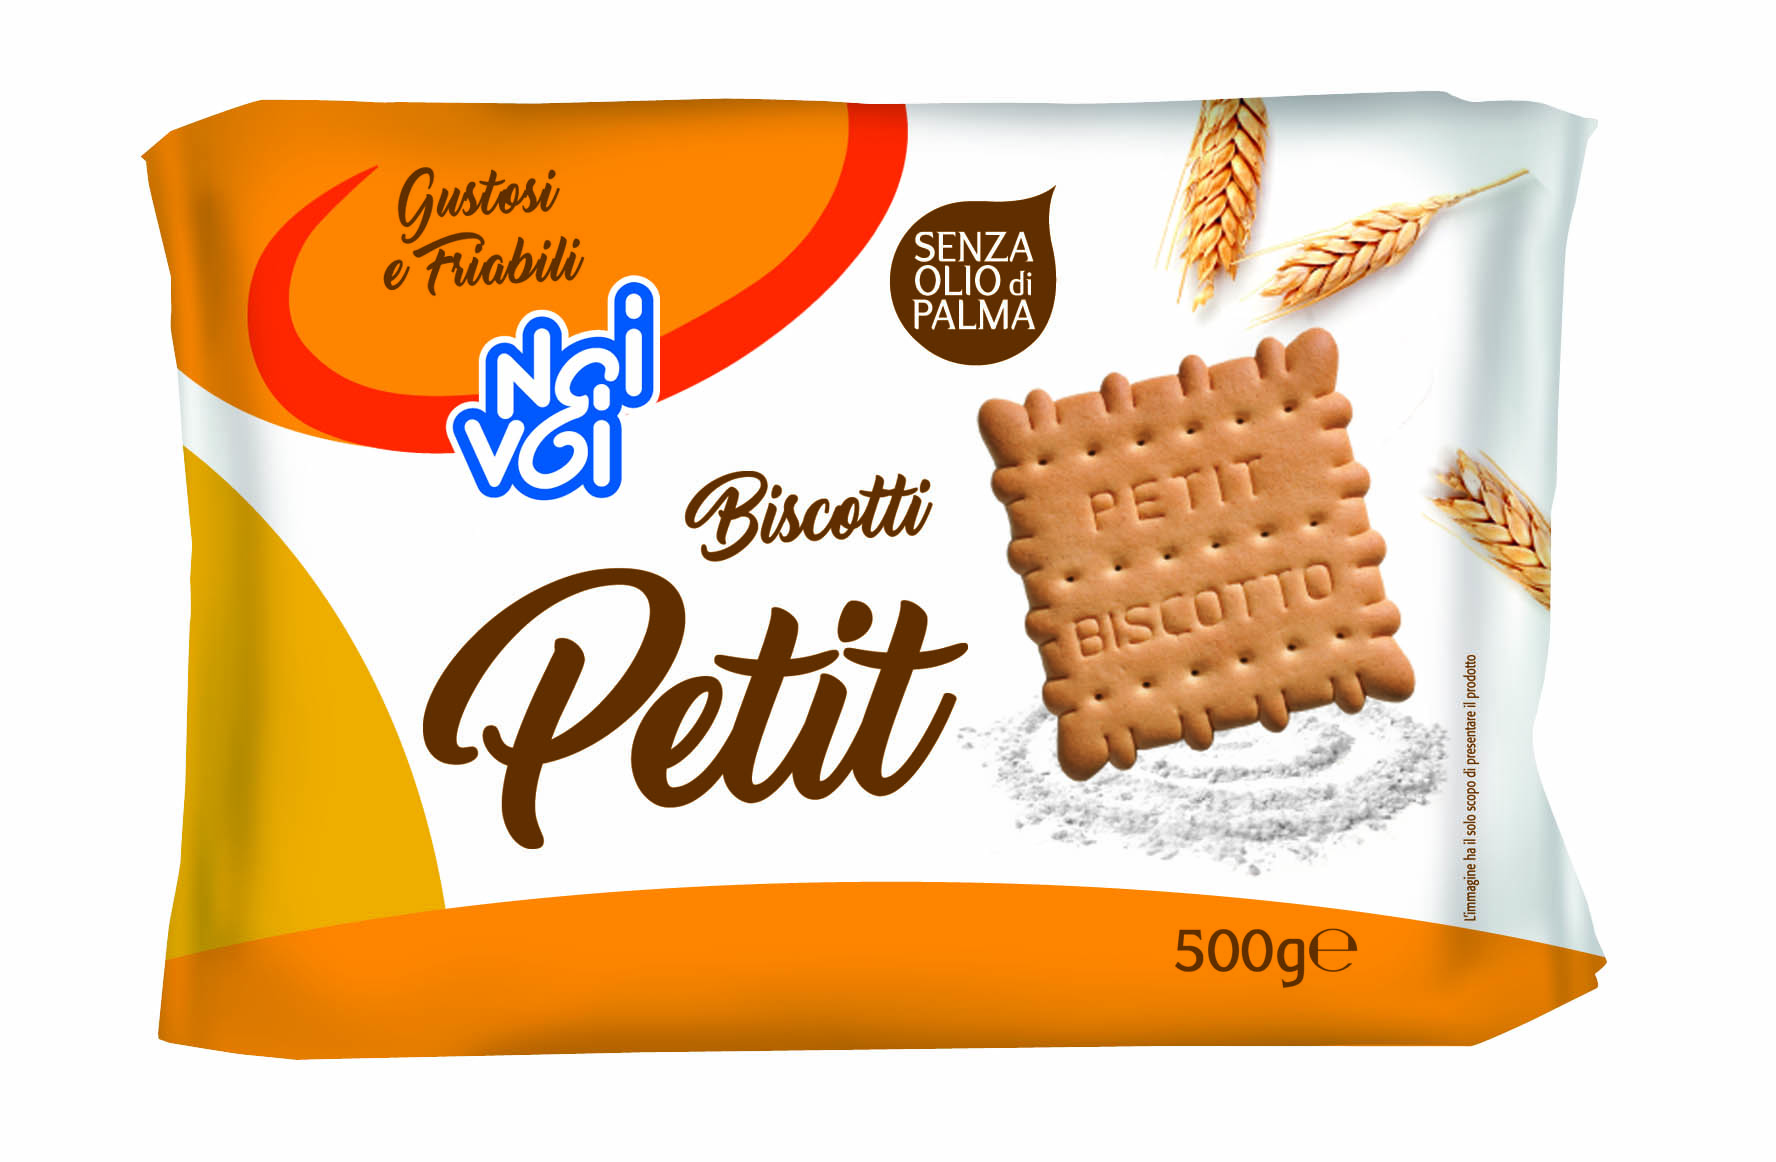 Biscotti Petit 500g